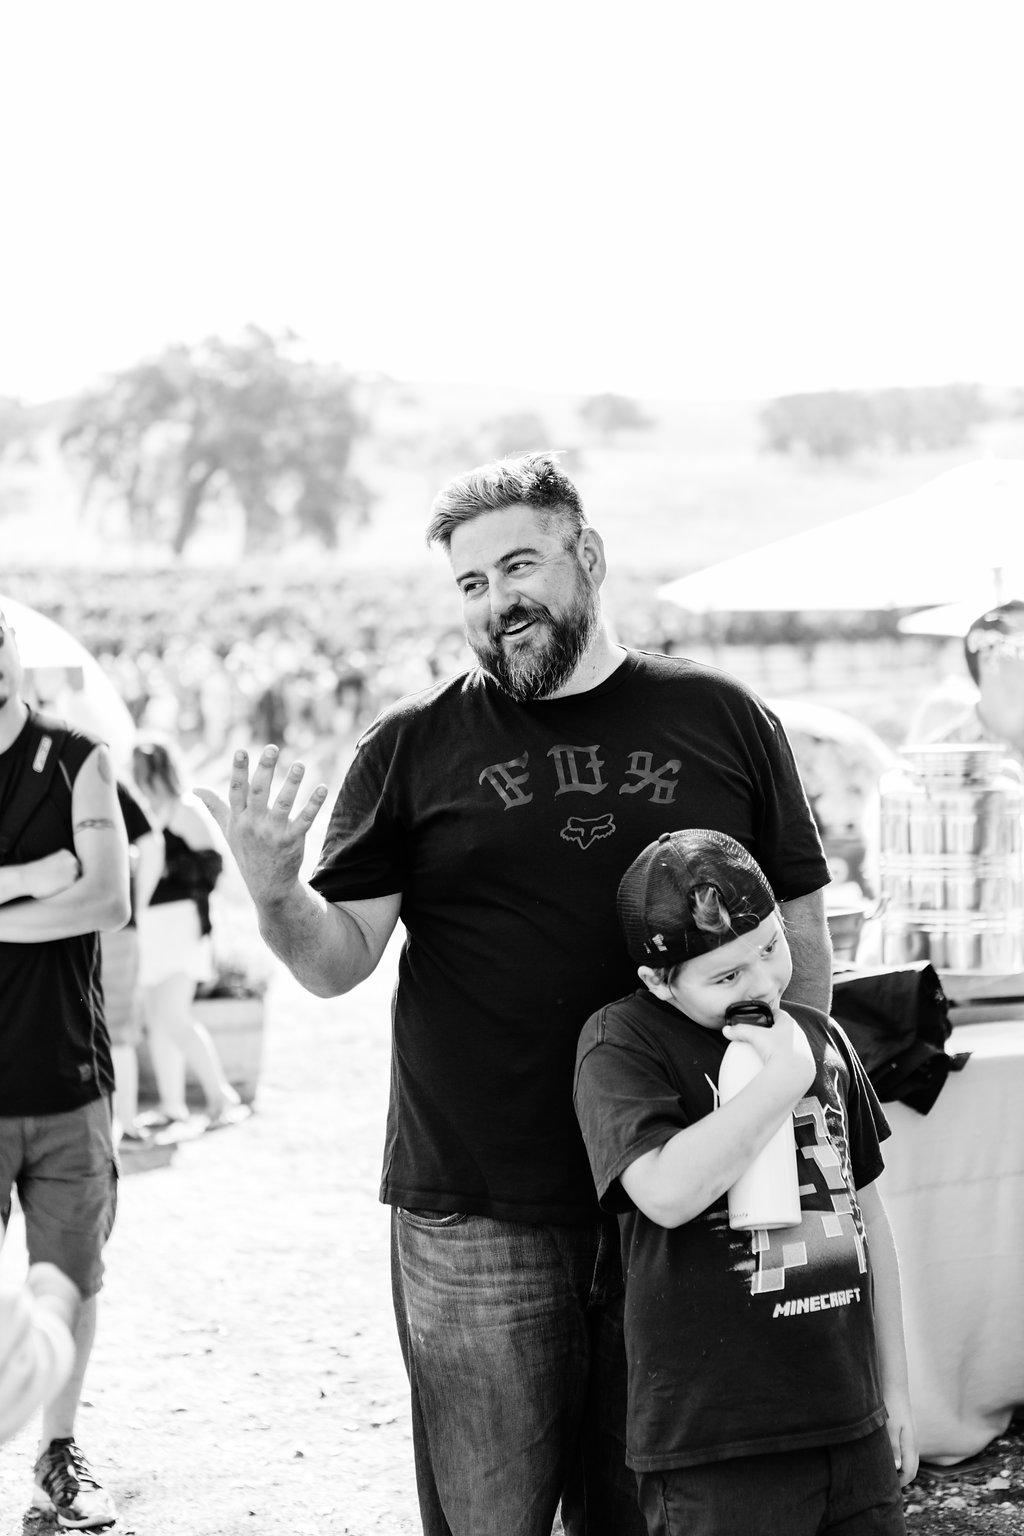 Saarloos&SonsVineyardDay2017HighResProofs-LauraPedrinoPhotographer-434.jpg